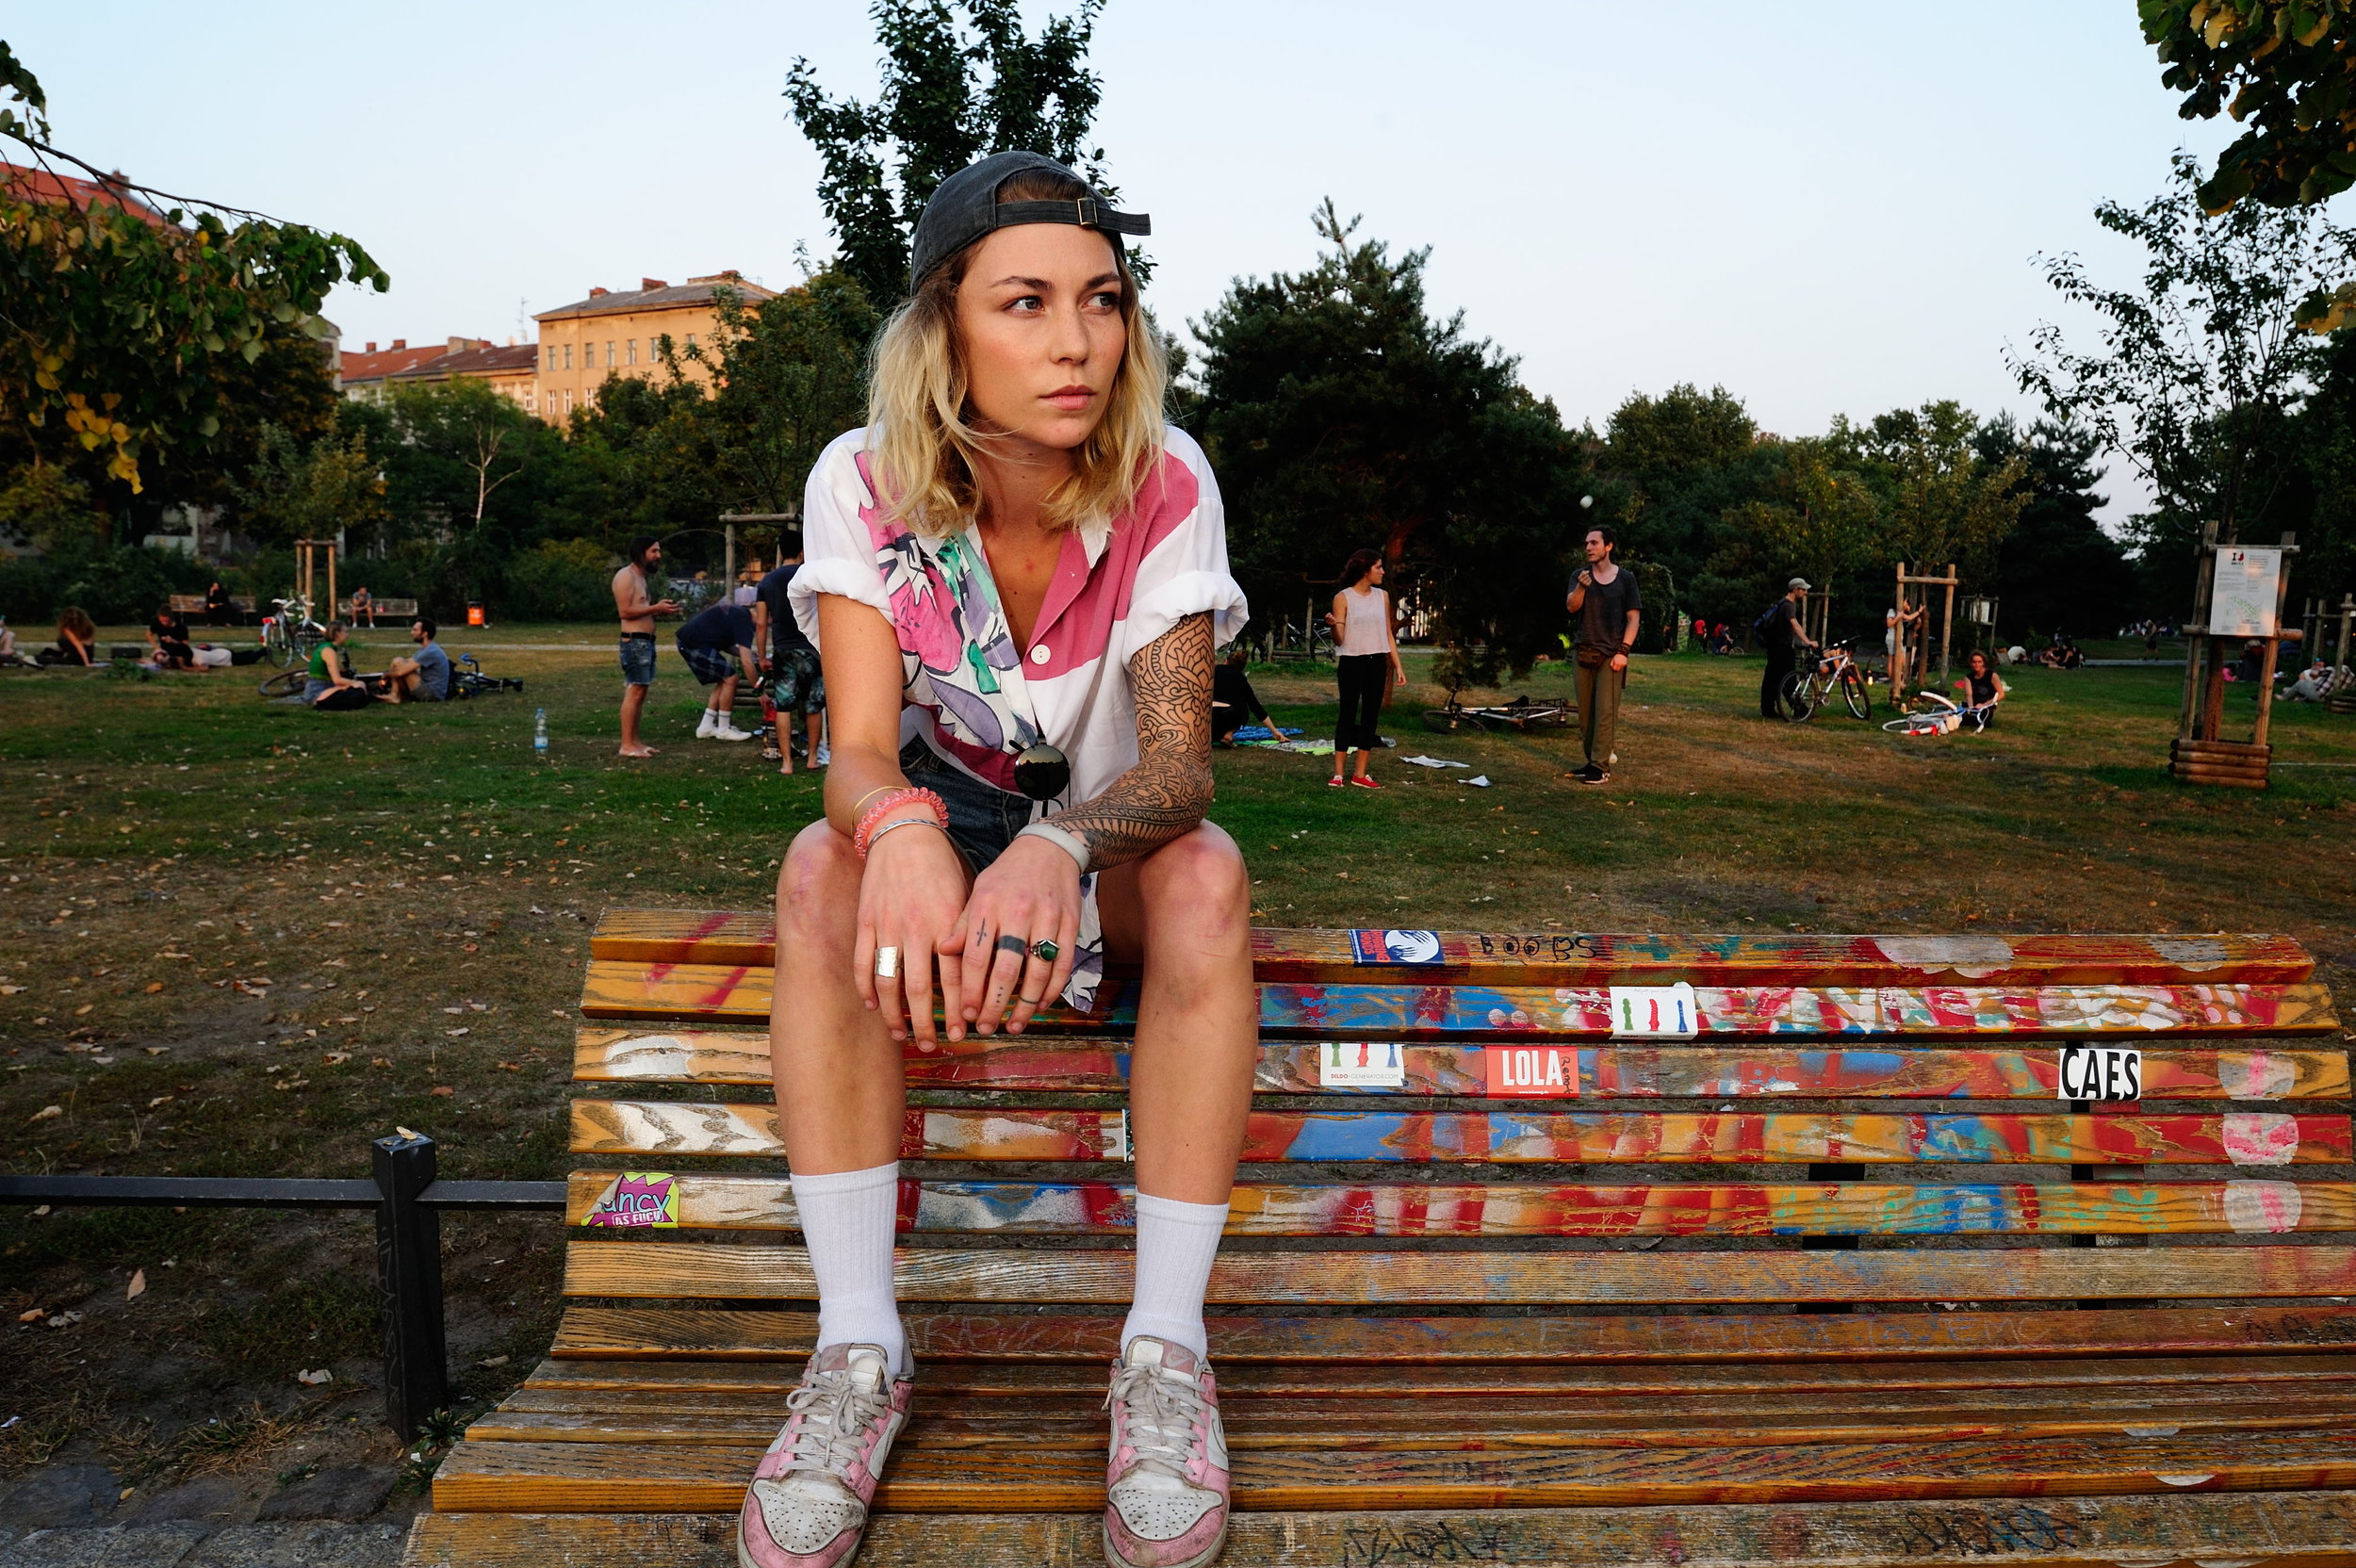 Models: Lea Lassere hotography:Joerg Brunsendorf Styling: Teodora Jimborean  Hair & Make-up: Gianluca Venerdini